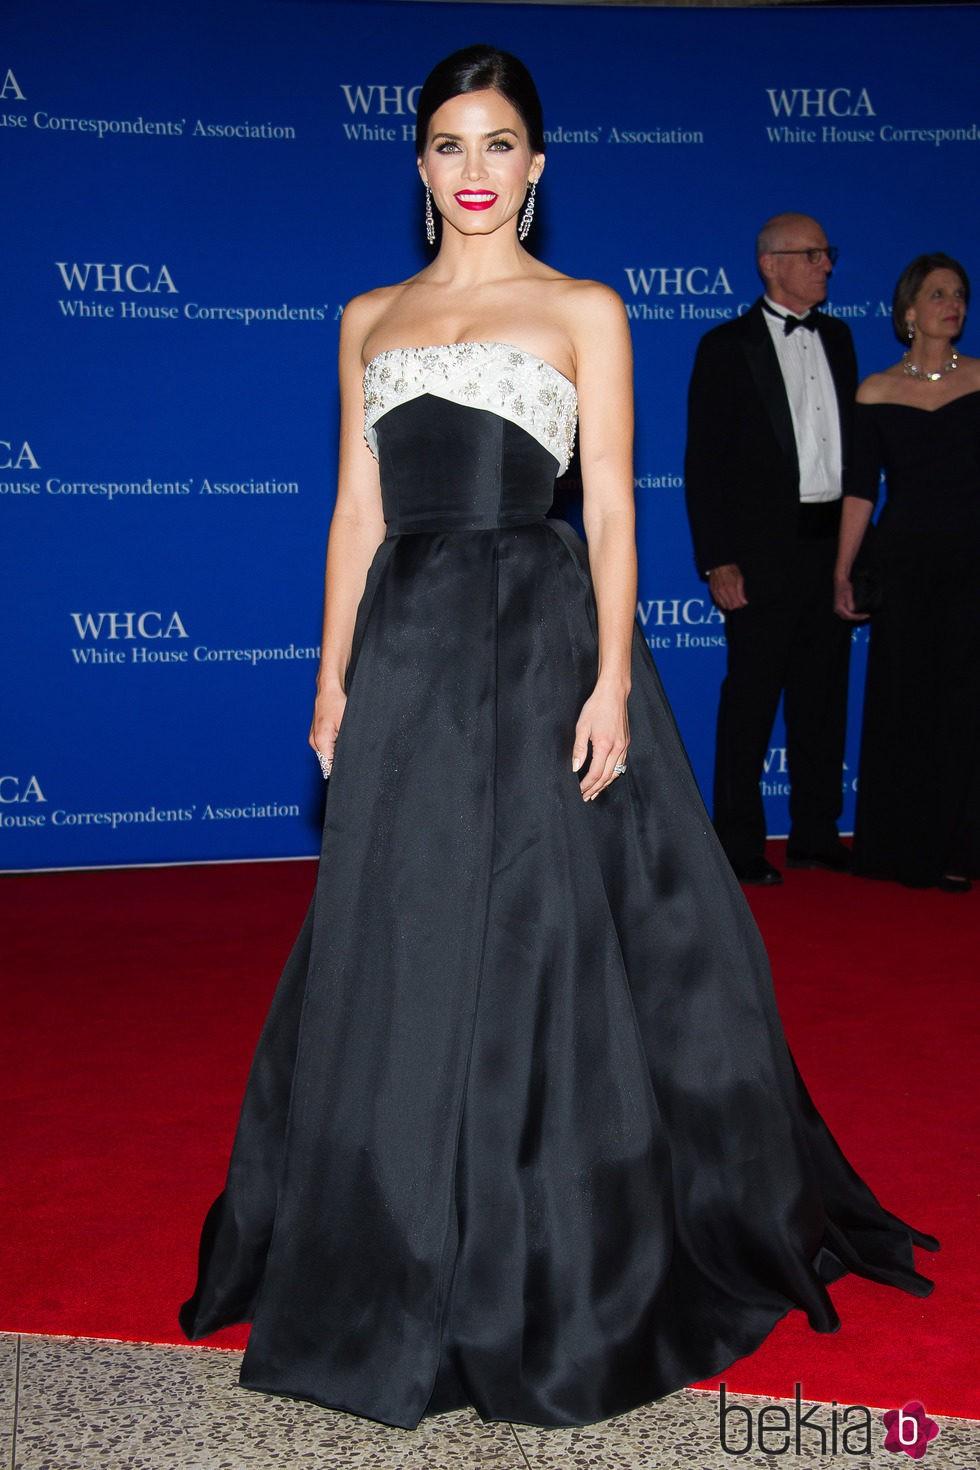 Jenna Dewan-Tatum en la Cena de Corresponsales de la Casa Blanca 2015